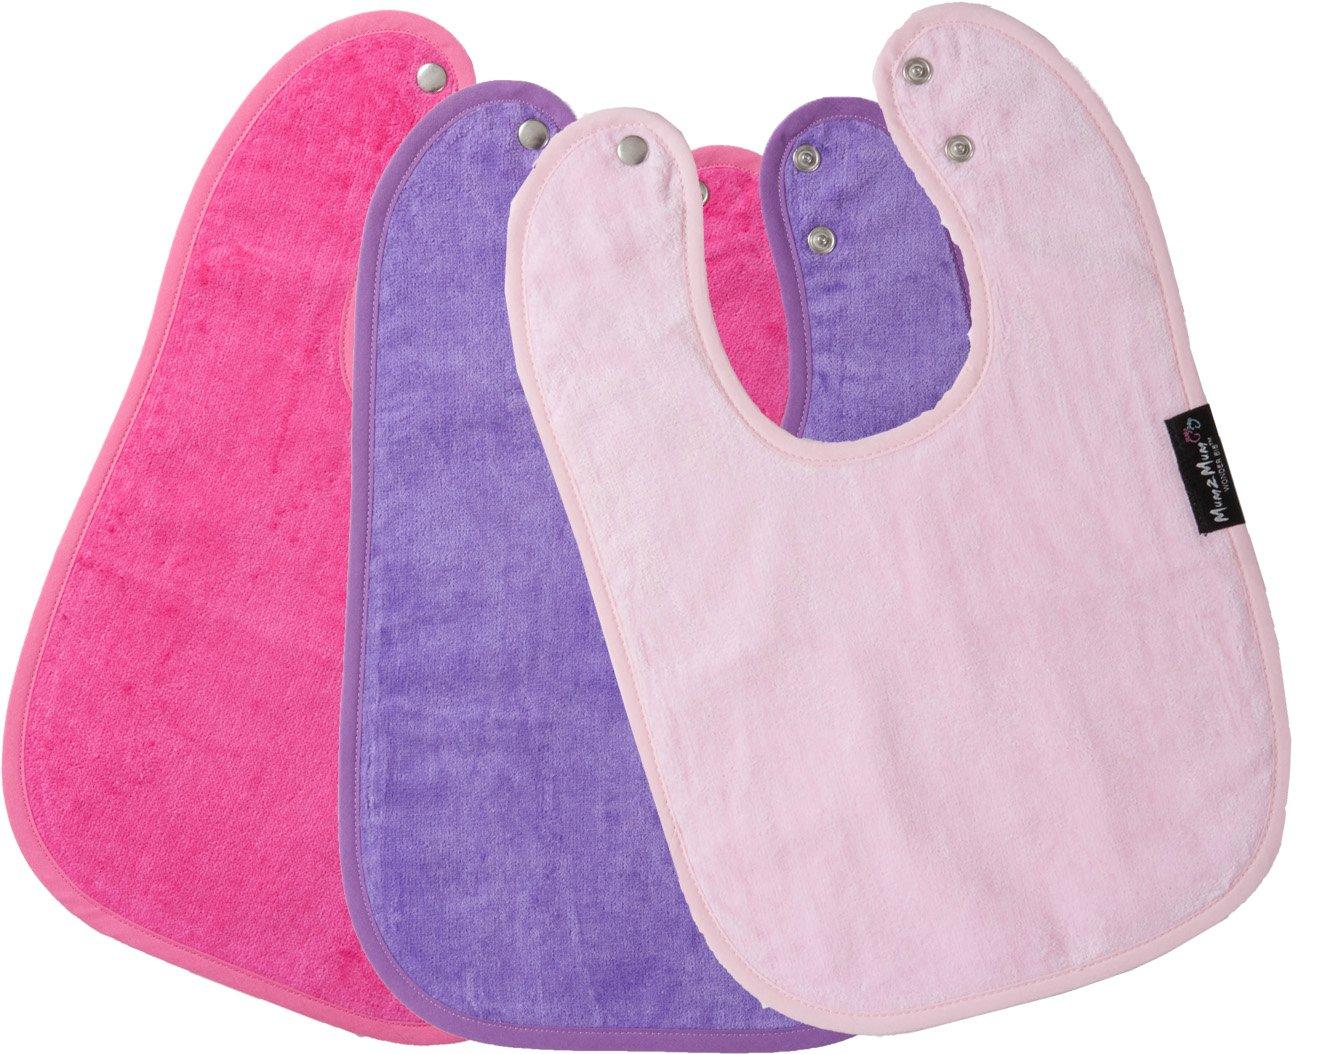 Mum2Mum Standard Wonder Bib Multipack in Baby Pink/Cerise/Purple